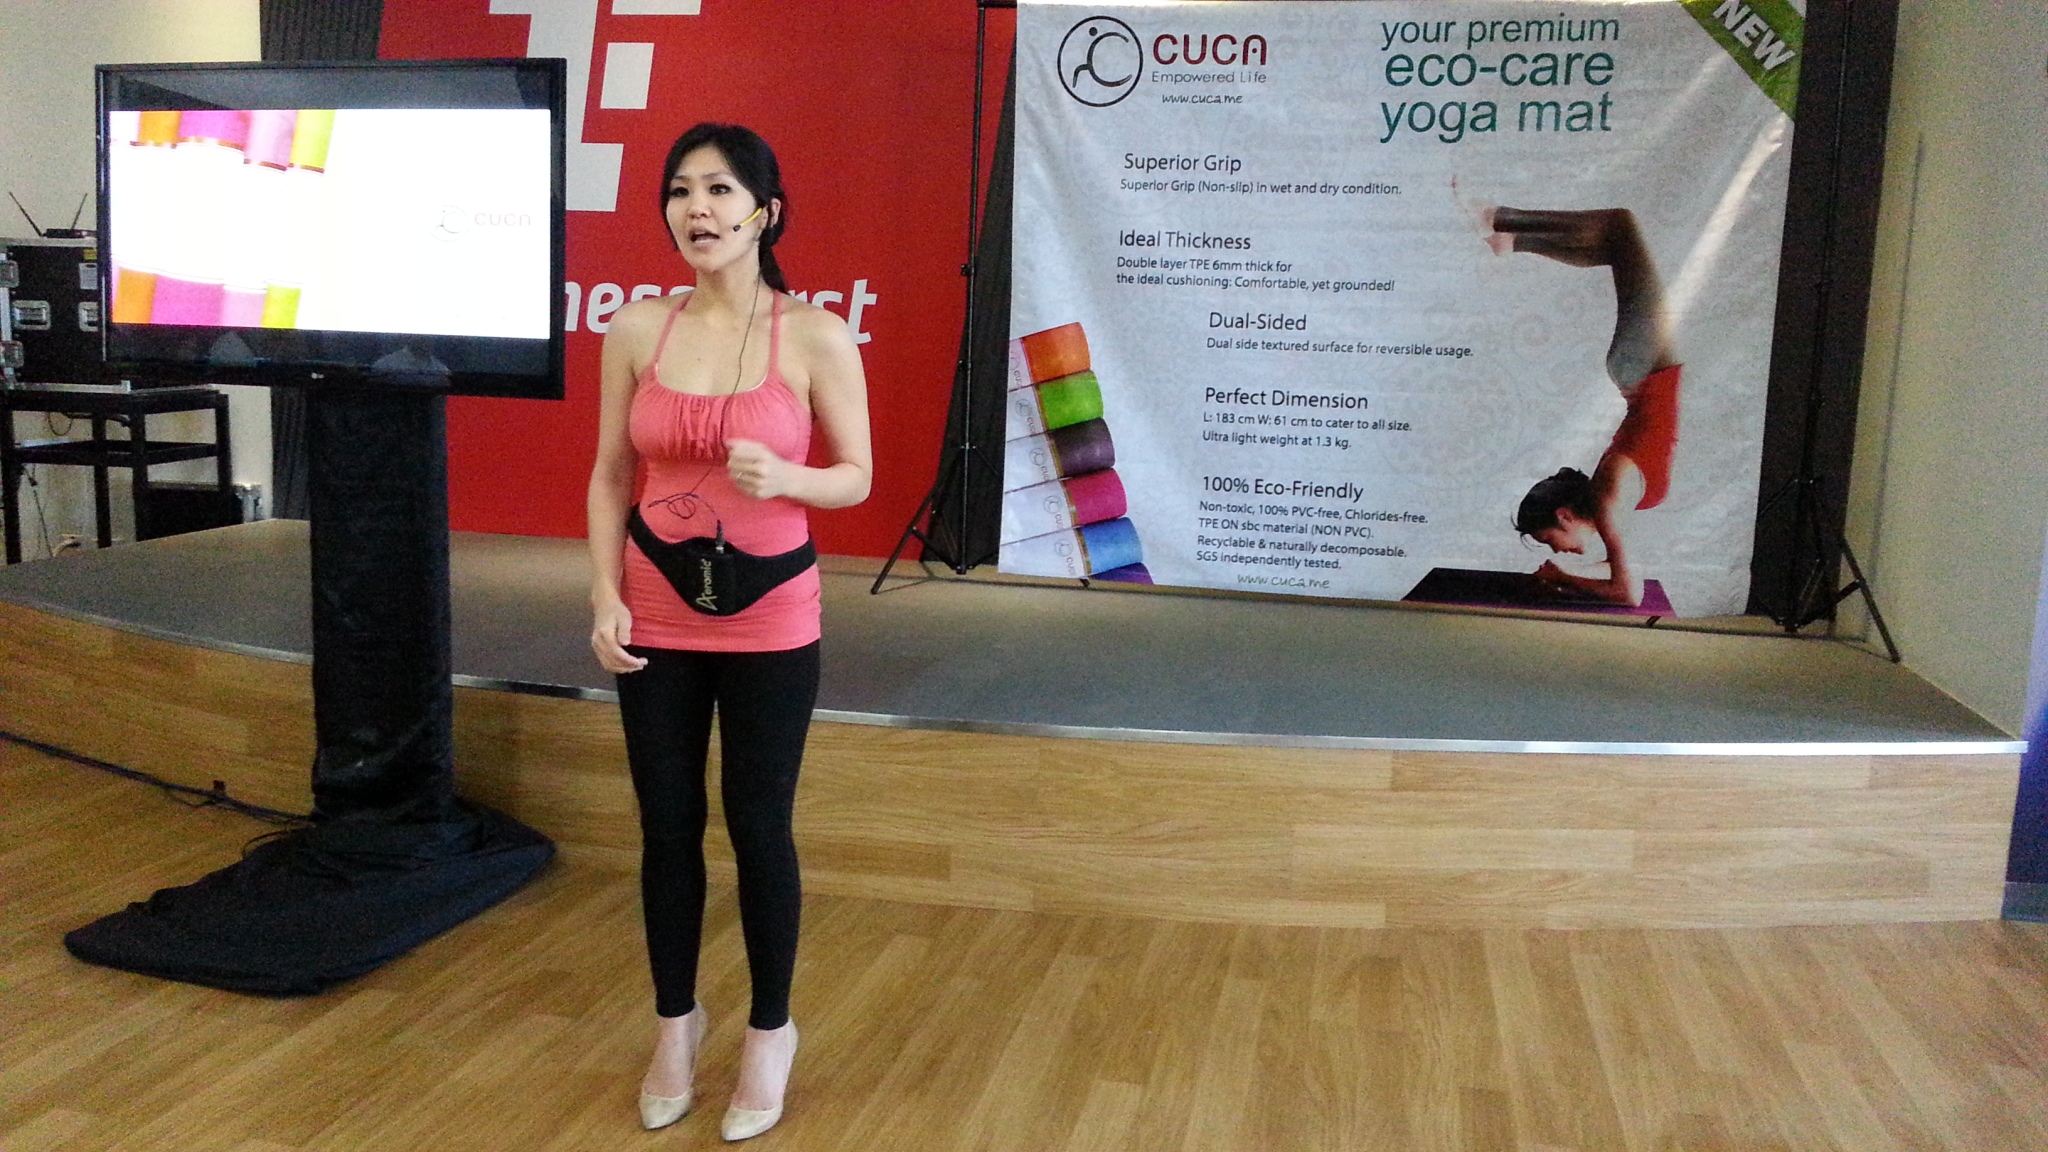 Meet The Cuca Eco Care Yoga Mat Yogini From Manila Matras 8mm Tpe Rubber Anti Slip Bag Limited Edition Priscilla Aliwarga Cucas Ceo On Fire